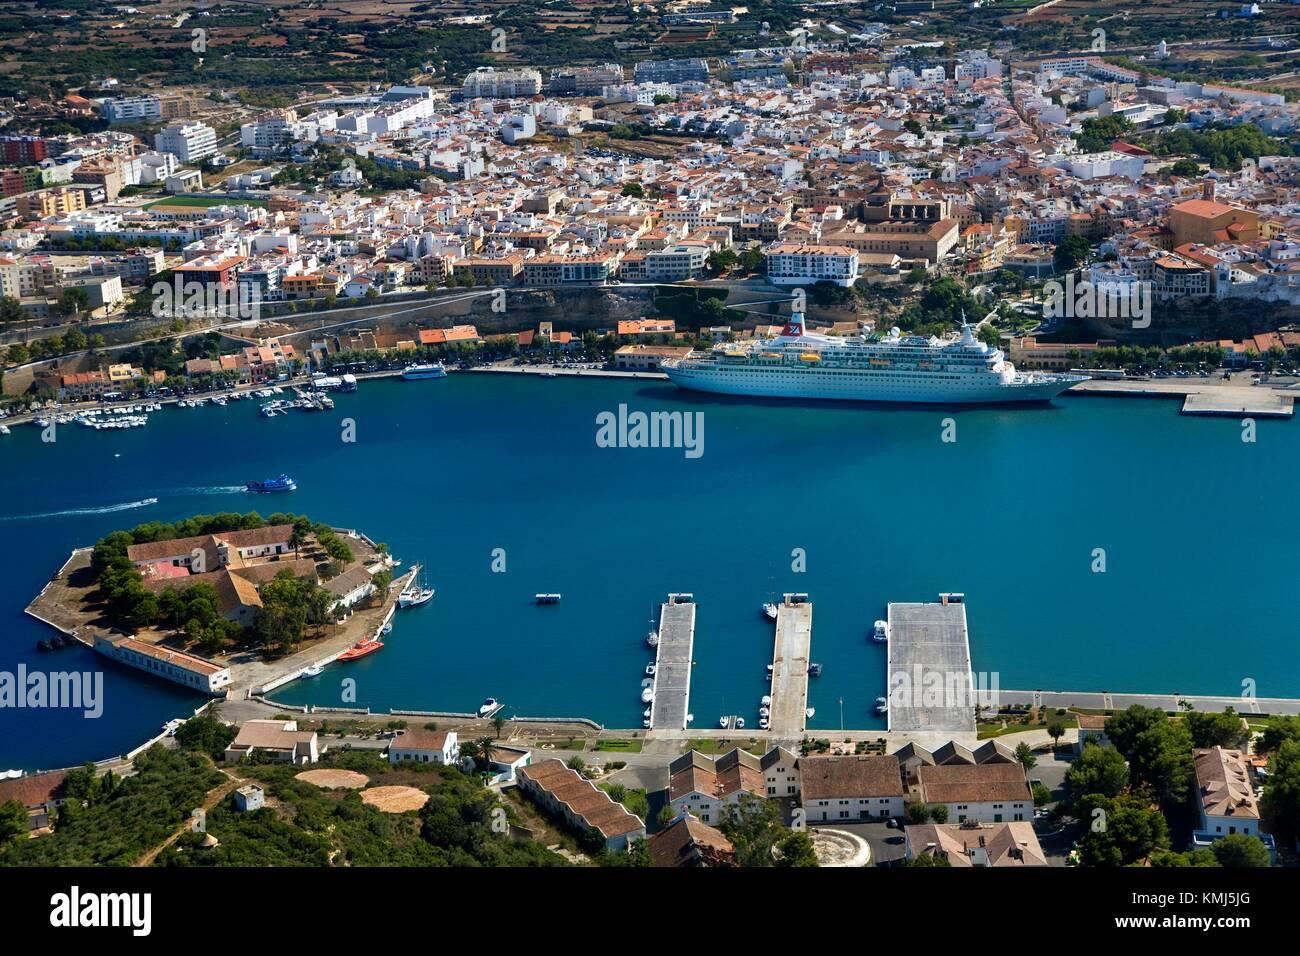 Mahon. Luftaufnahme. Insel Menorca. Balearen. Spanien. Stockbild